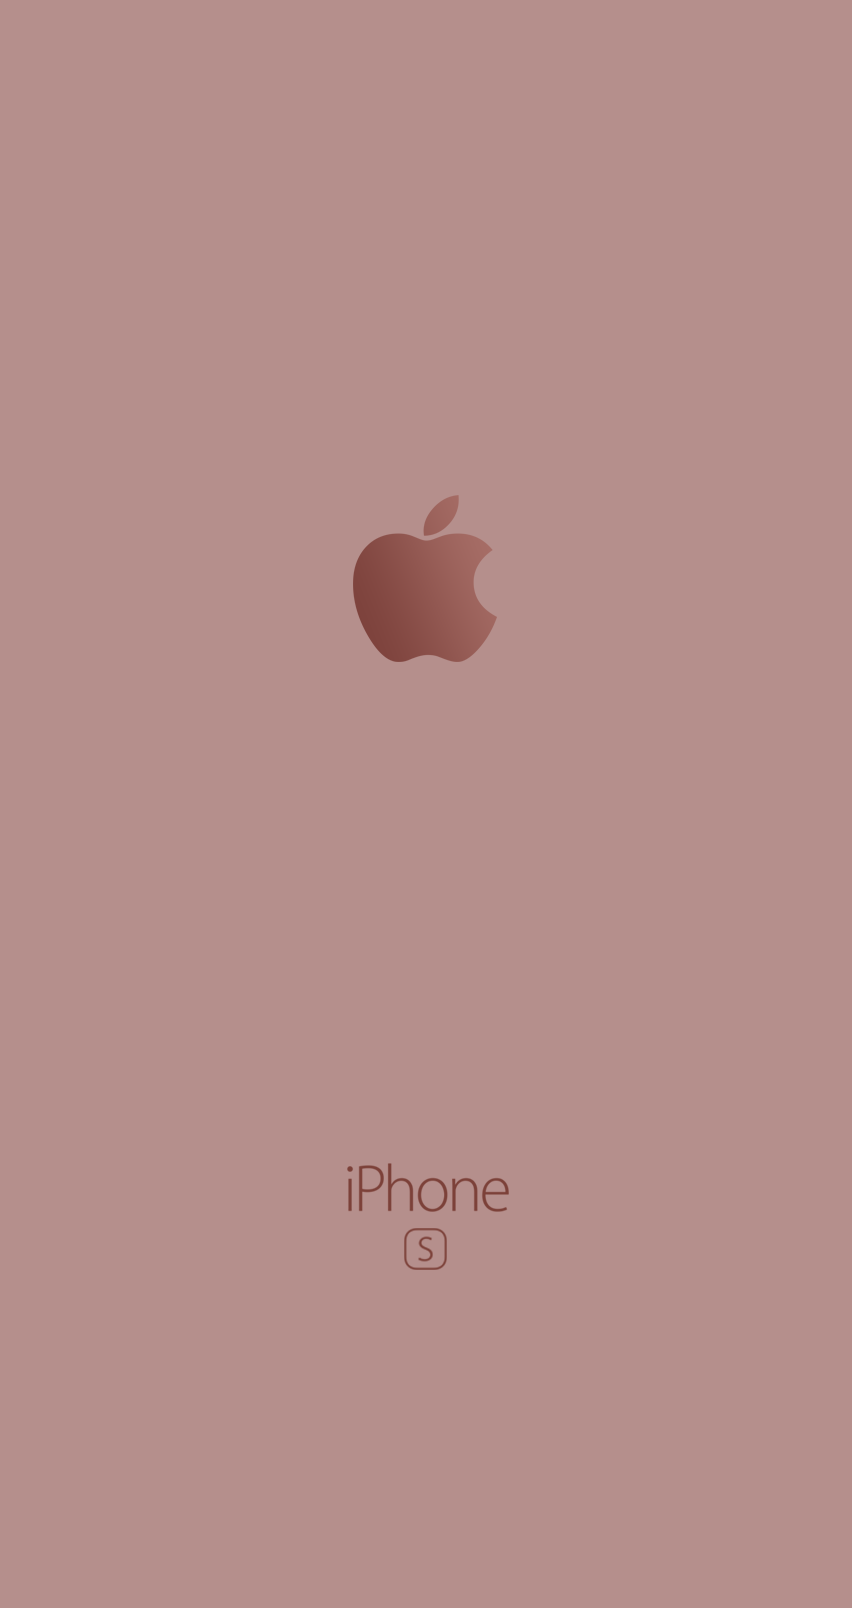 Iphone 6s Wallpaper pink logo apple fond d'écran rose